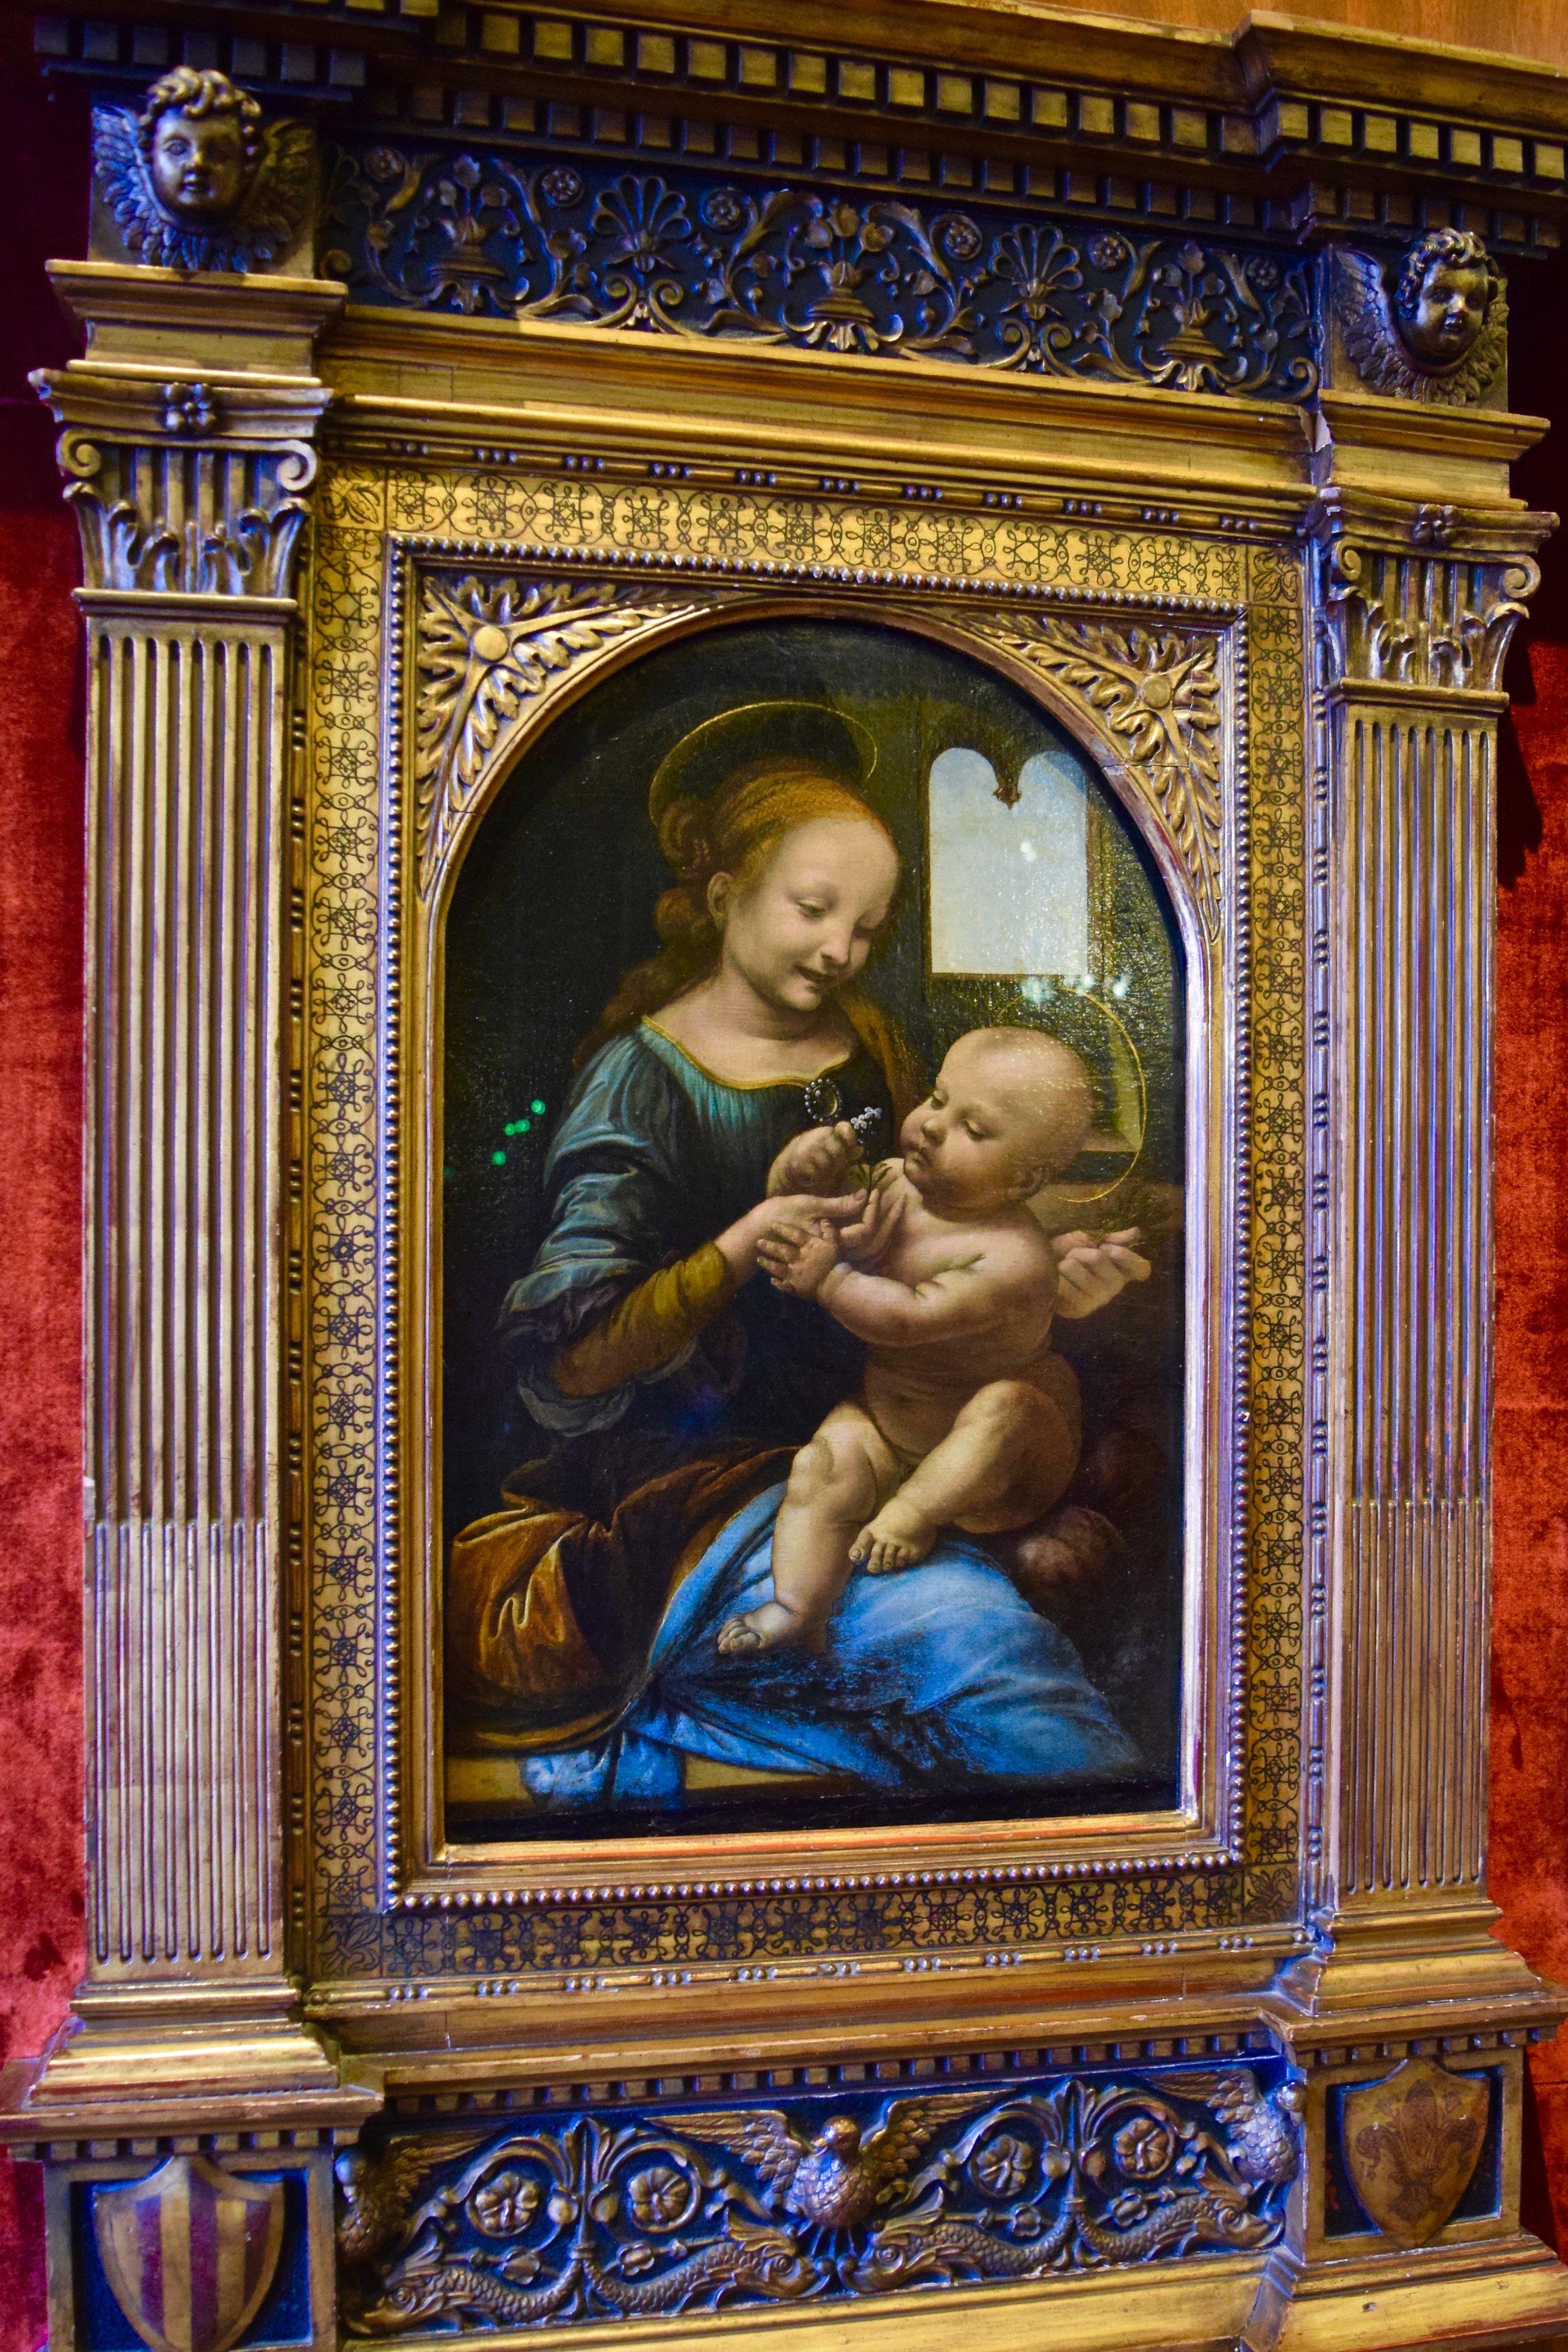 Benois Madonna by Leonardo da Vinci